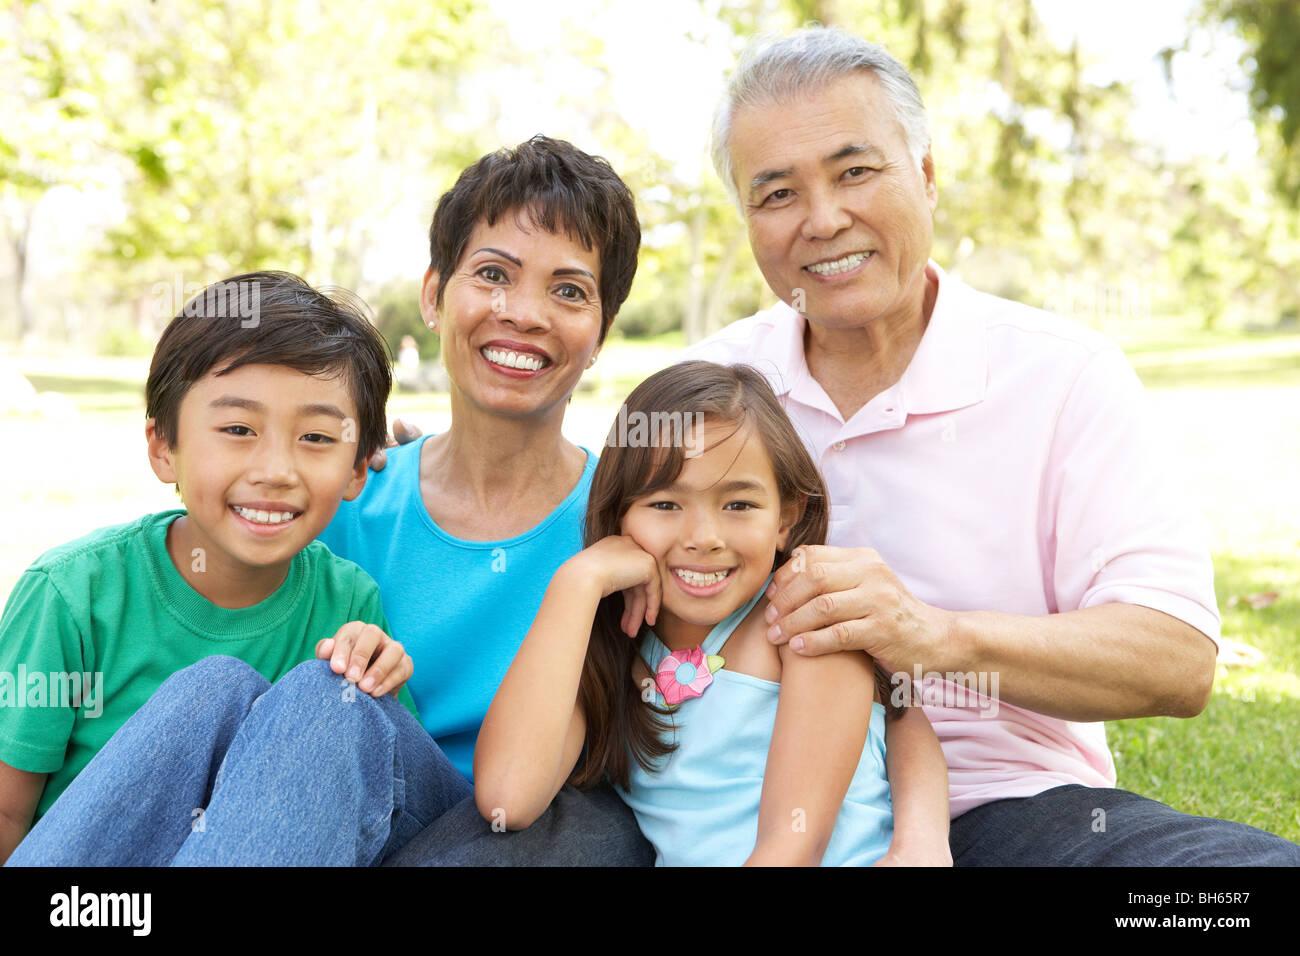 Portrait Of Grandparents With Grandchildren In Park Stock Photo